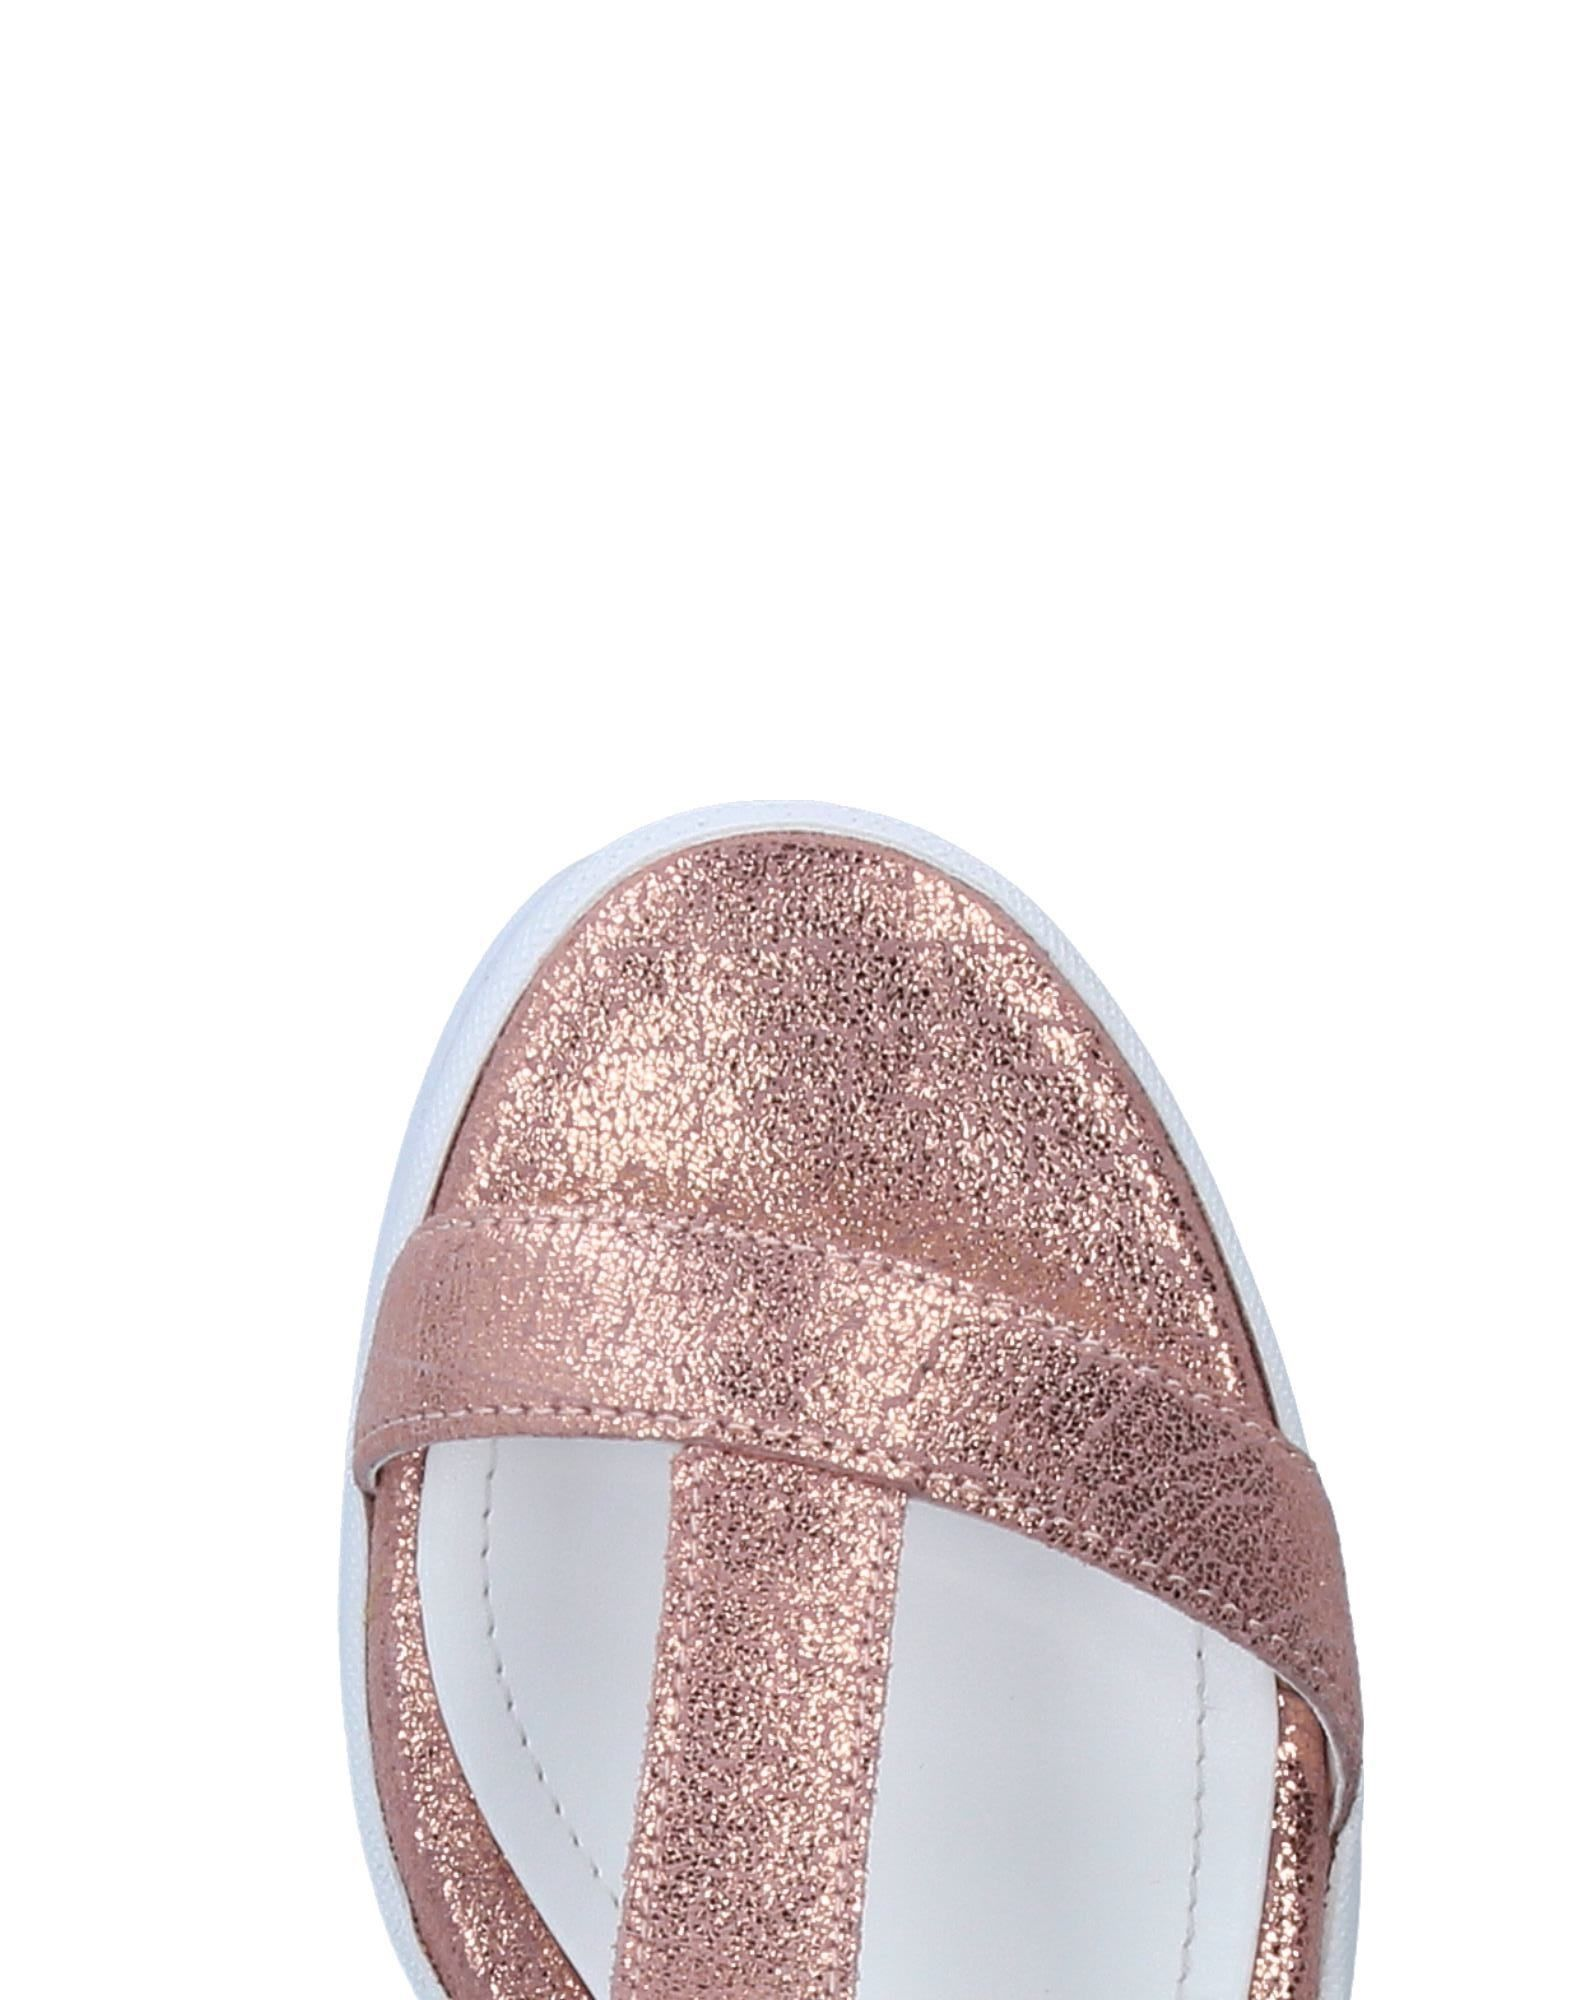 Ruco Line Sandalen Damen   Damen 11334364LV Gute Qualität beliebte Schuhe 9cae25